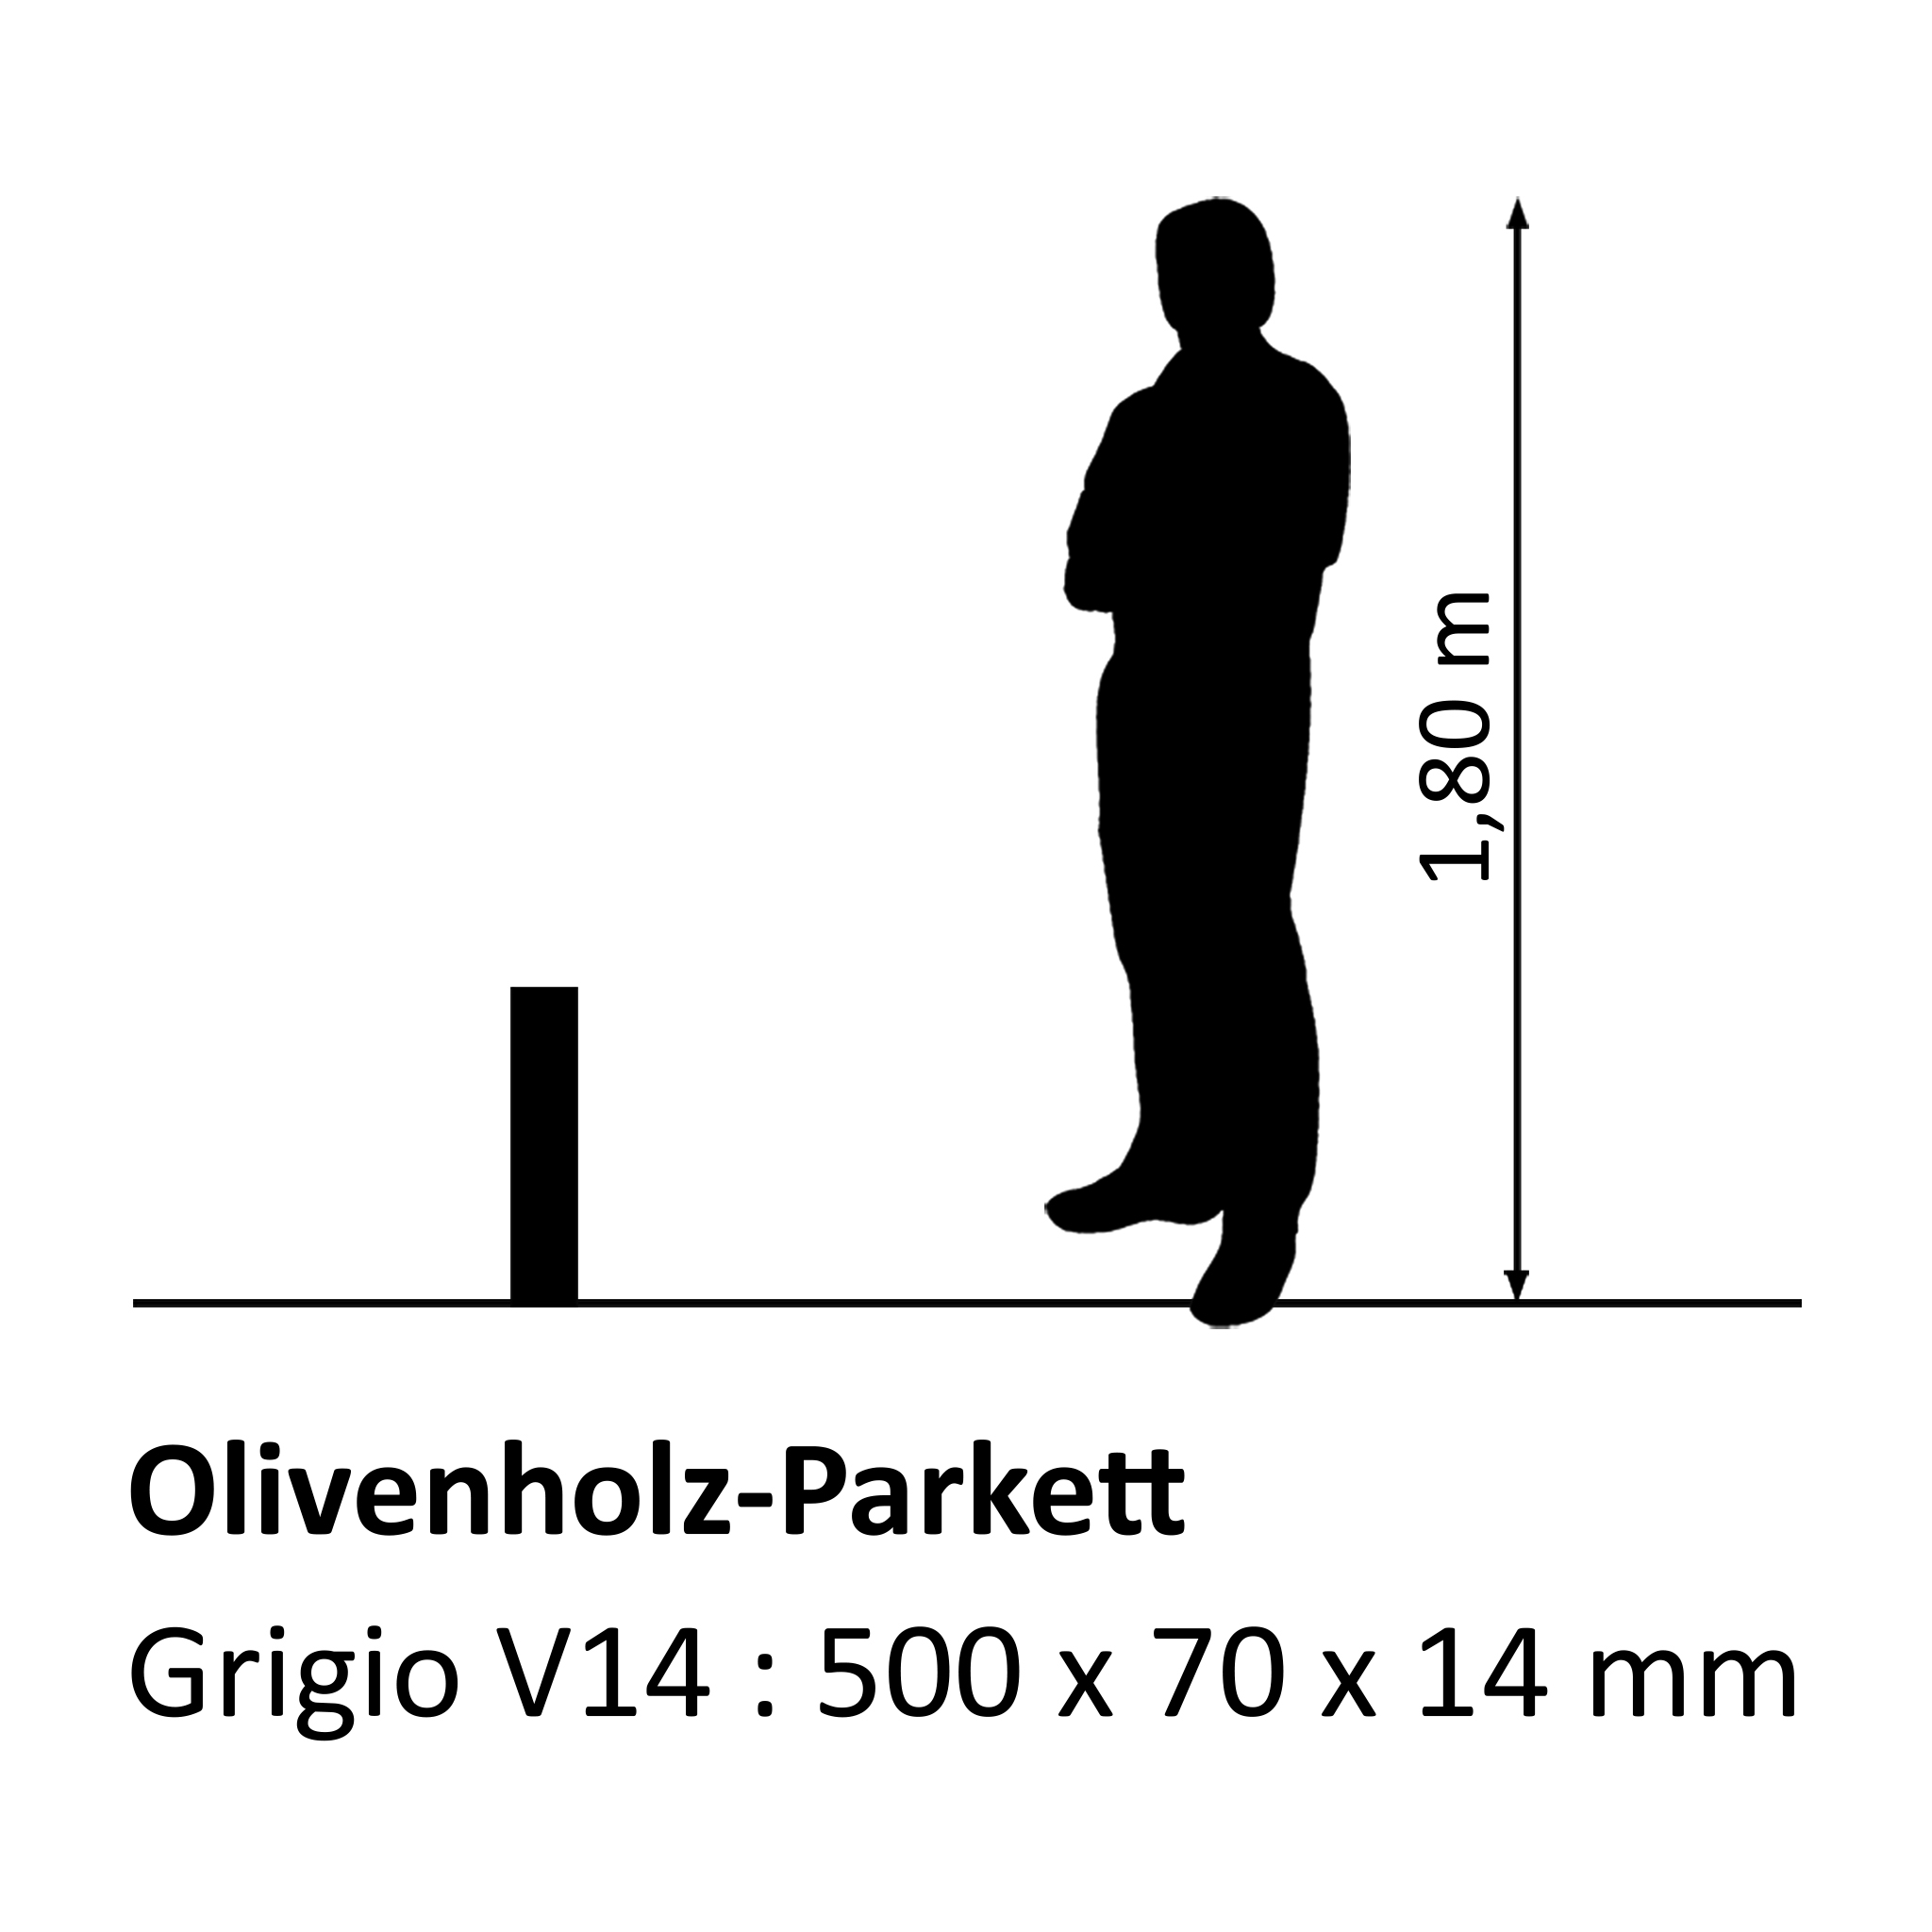 Olivenholzparkett Grigio V14